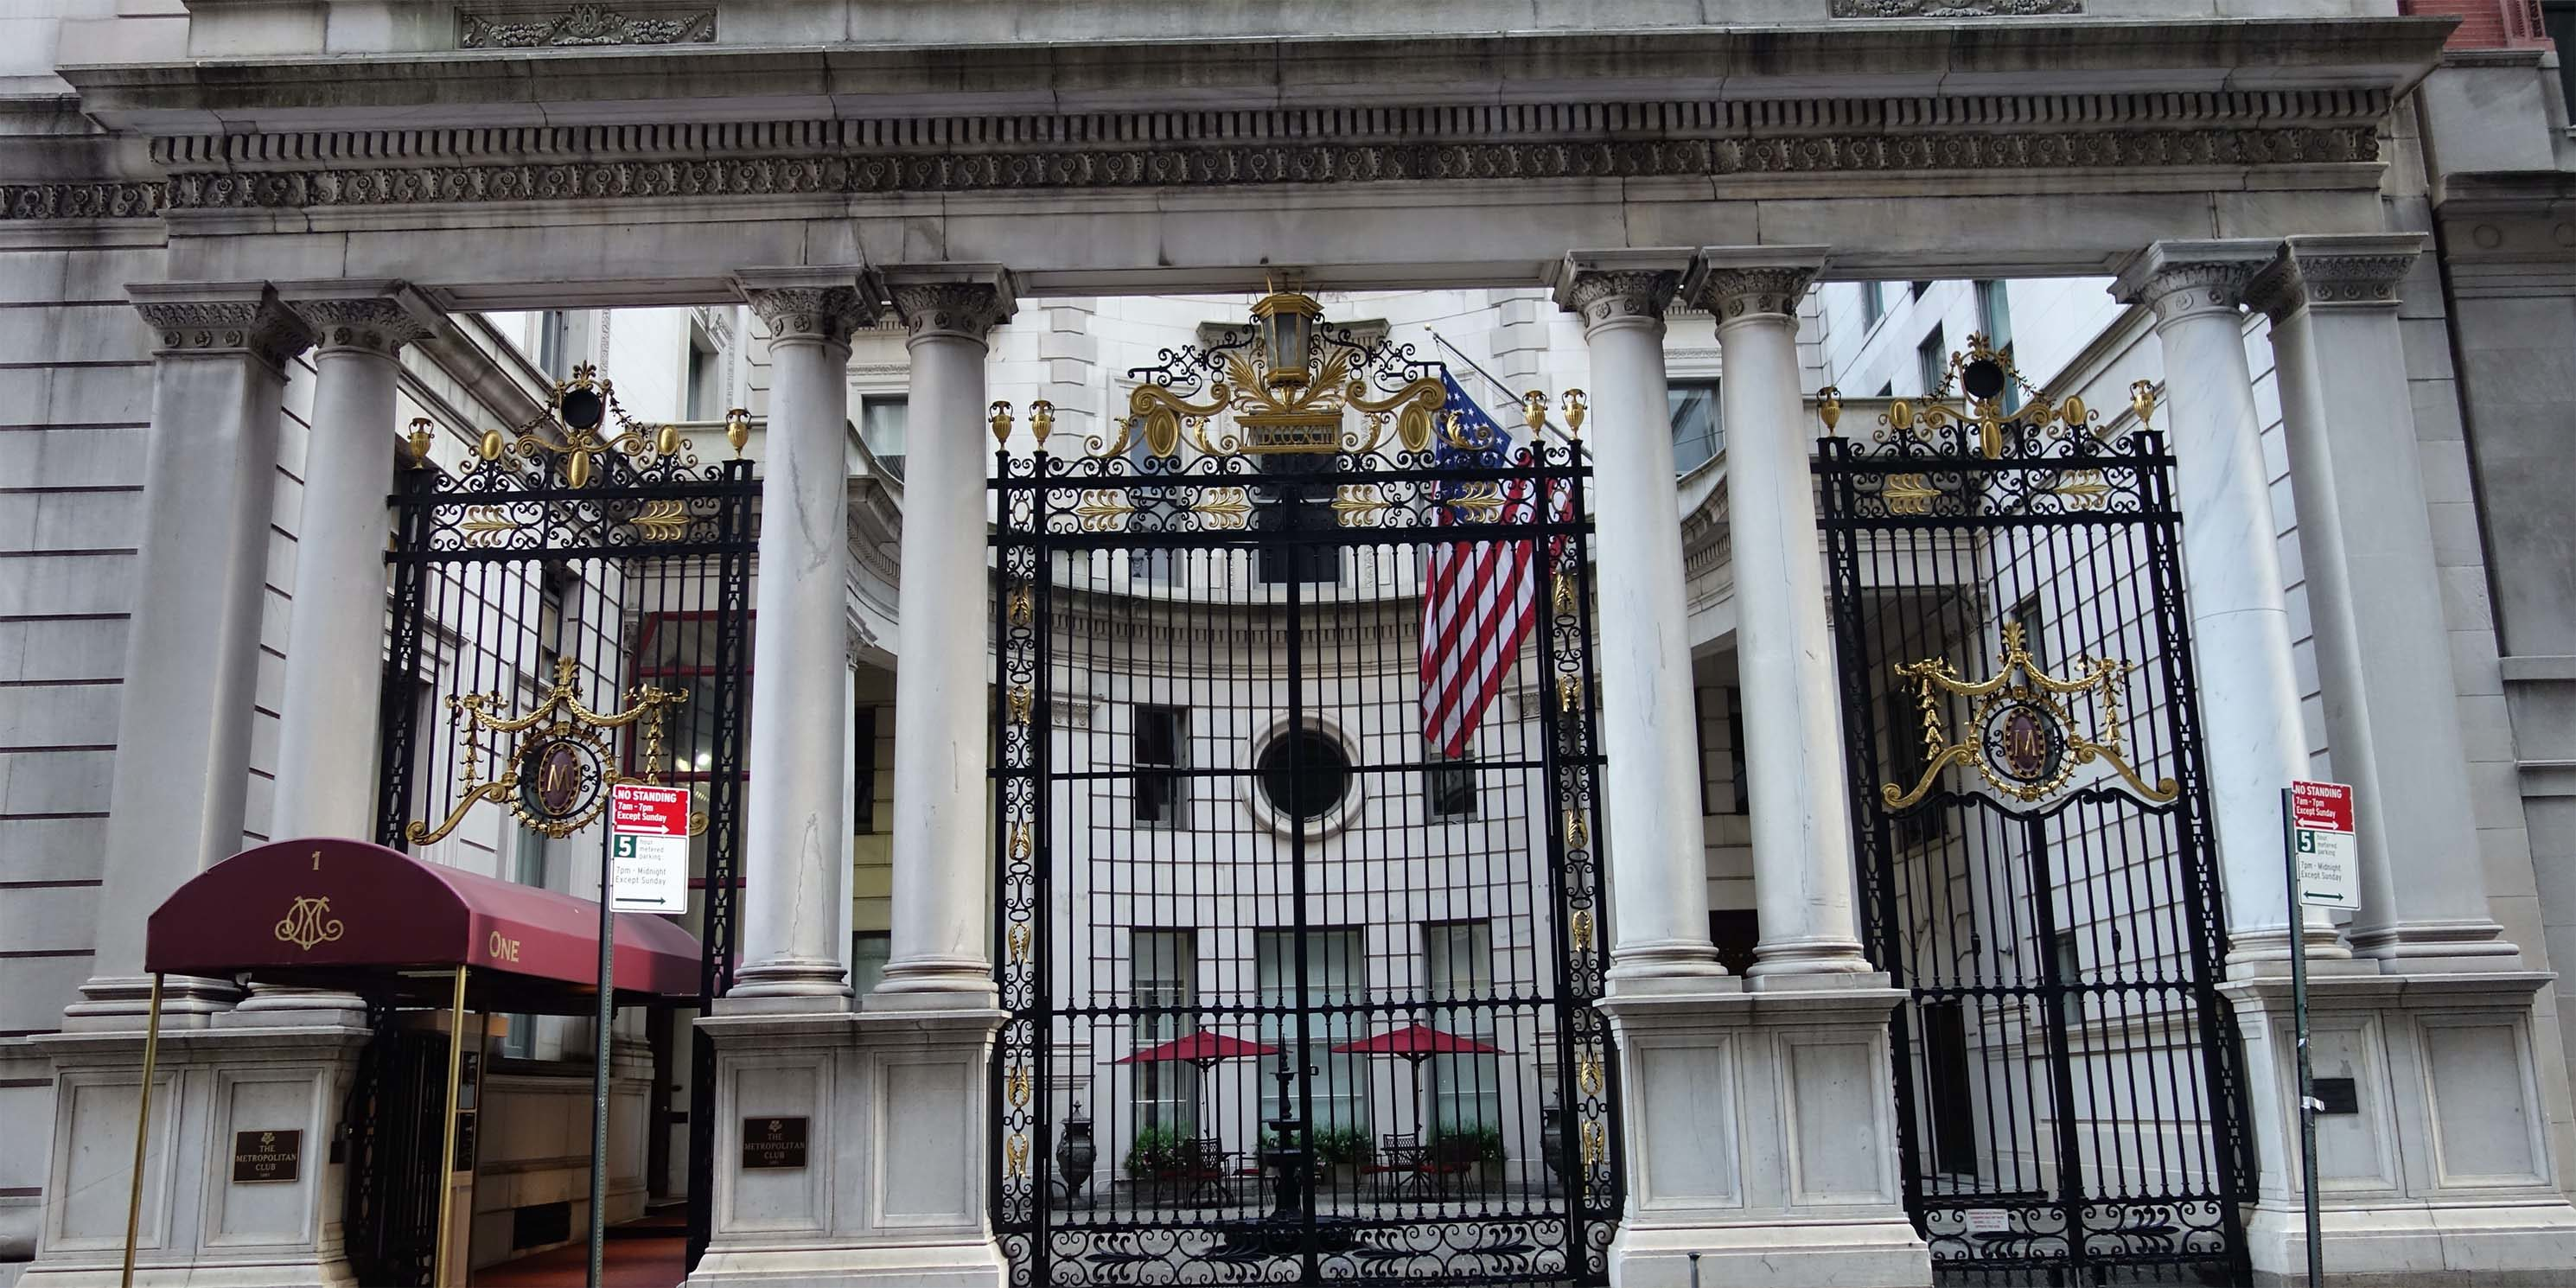 entrance to the Metropolitan Club